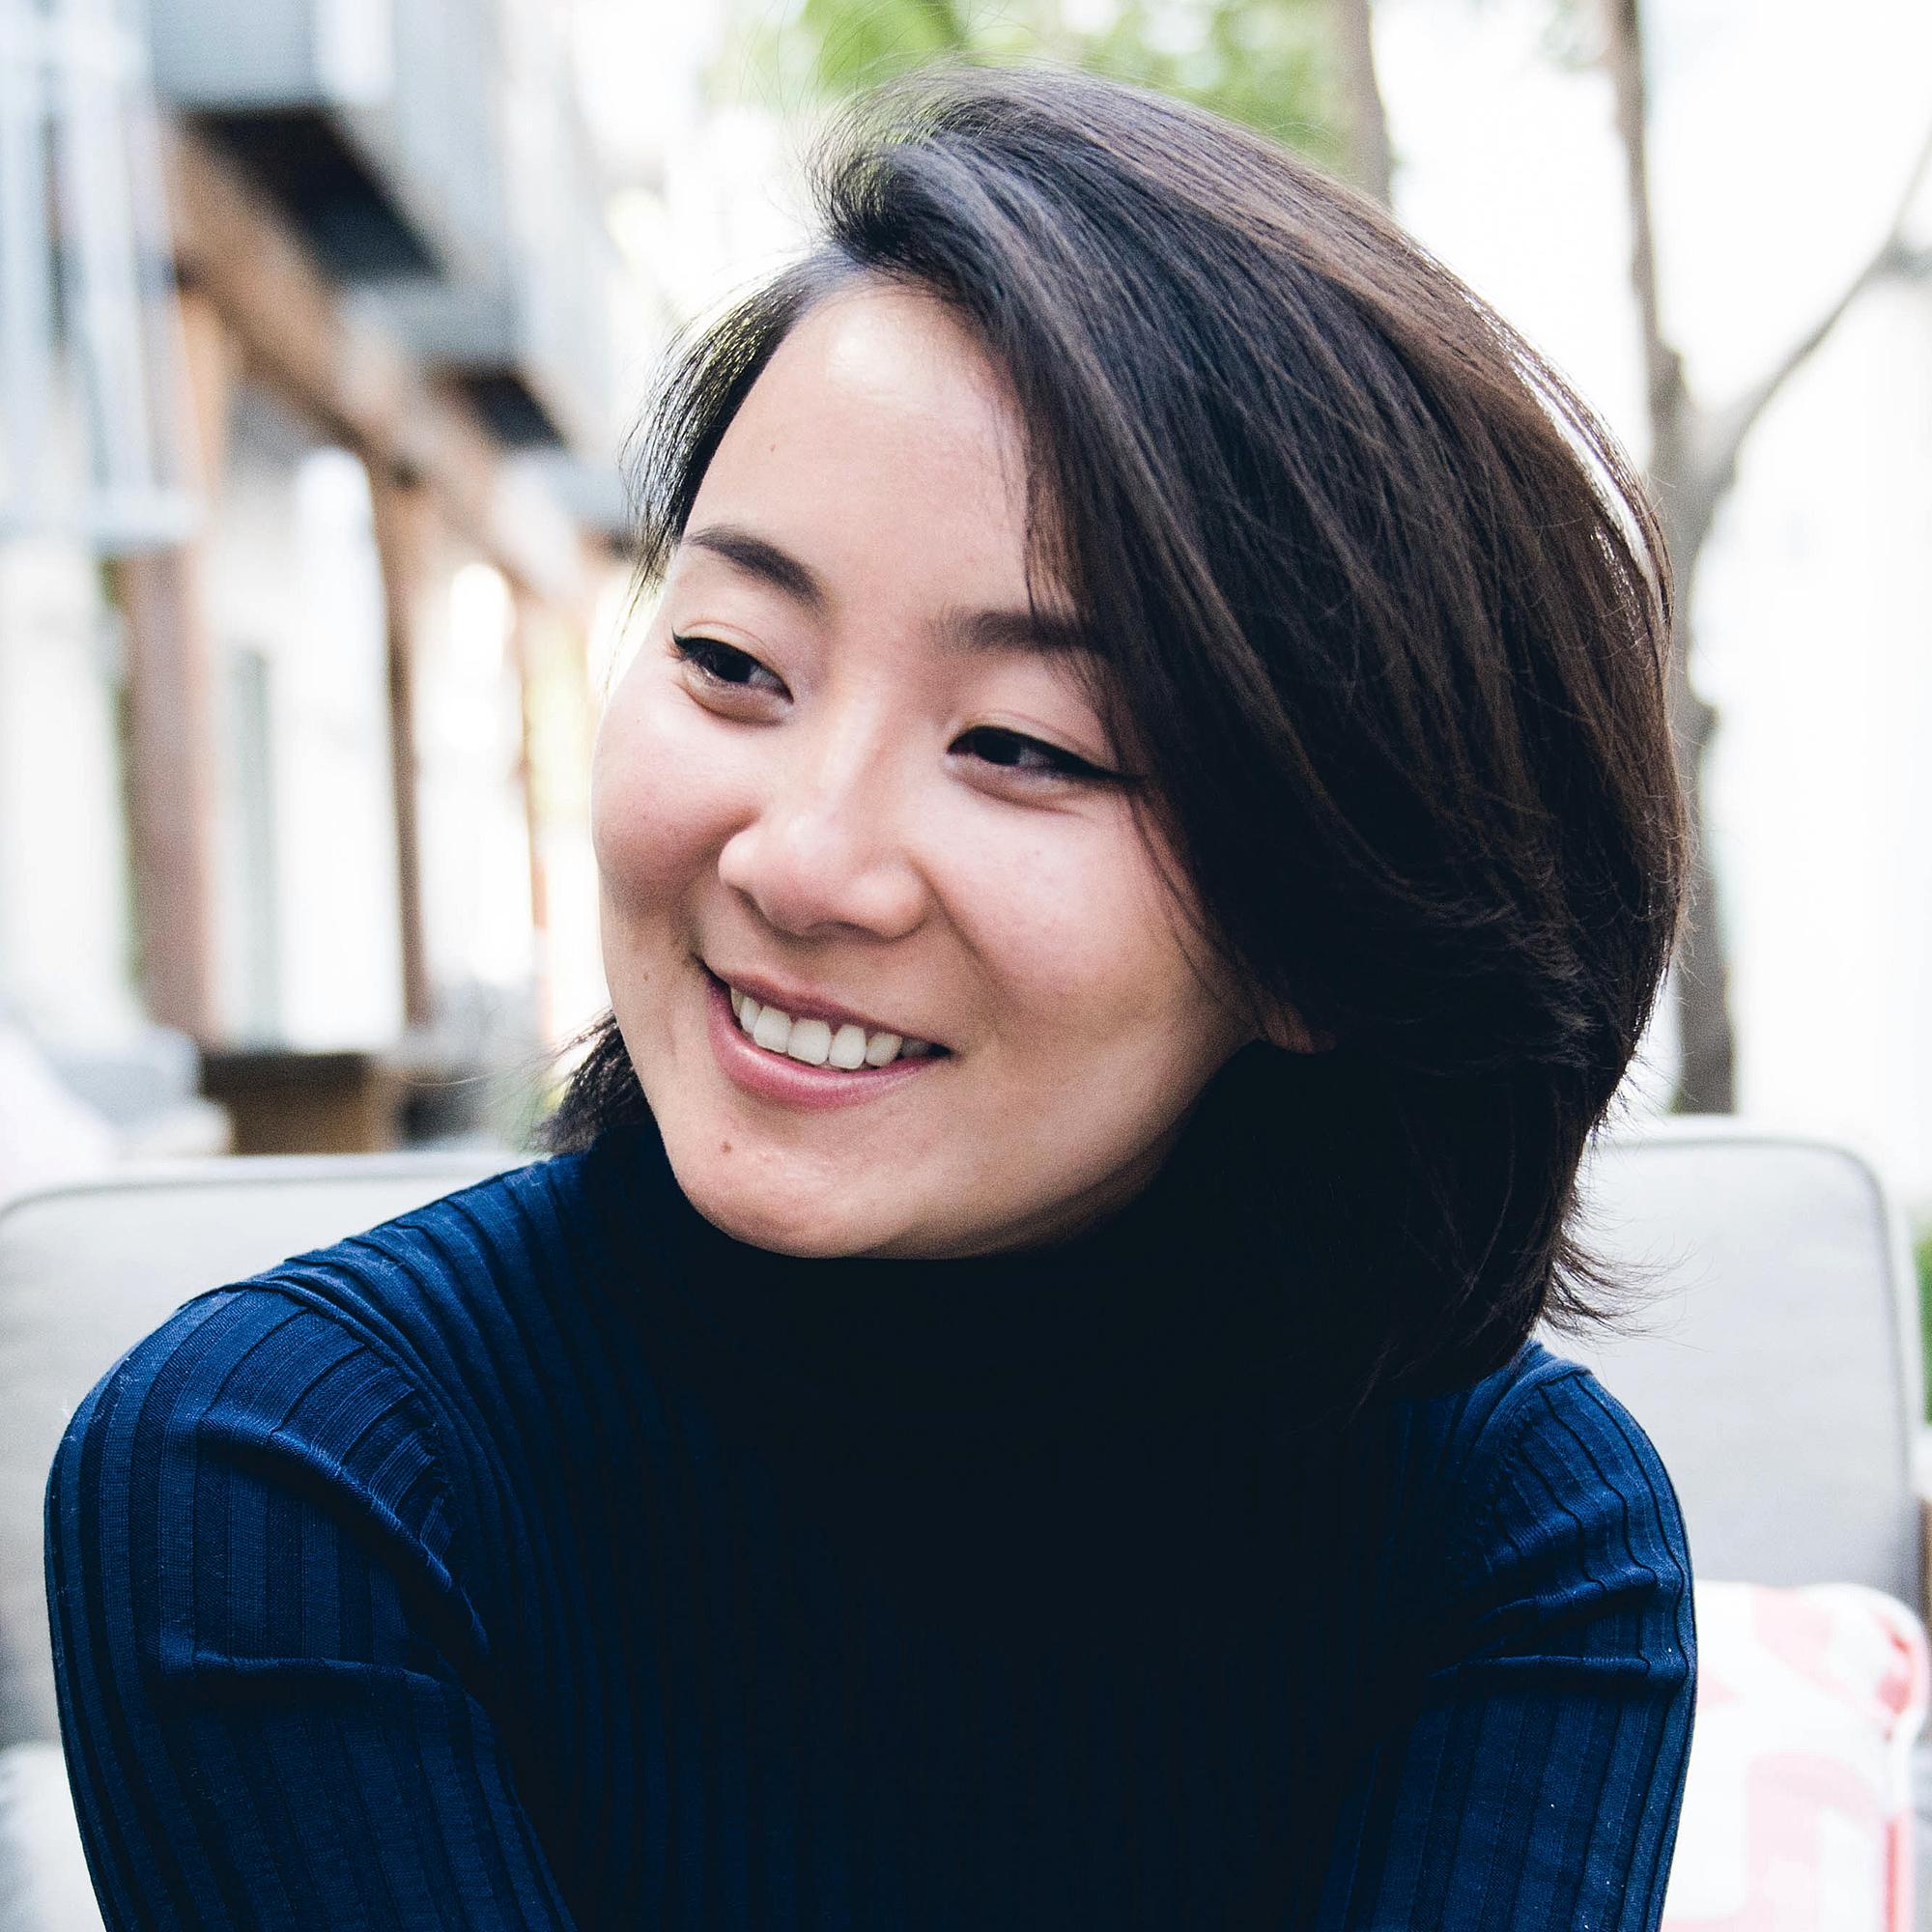 Marie Lu Author photo CR: Primo/Penguin Random House